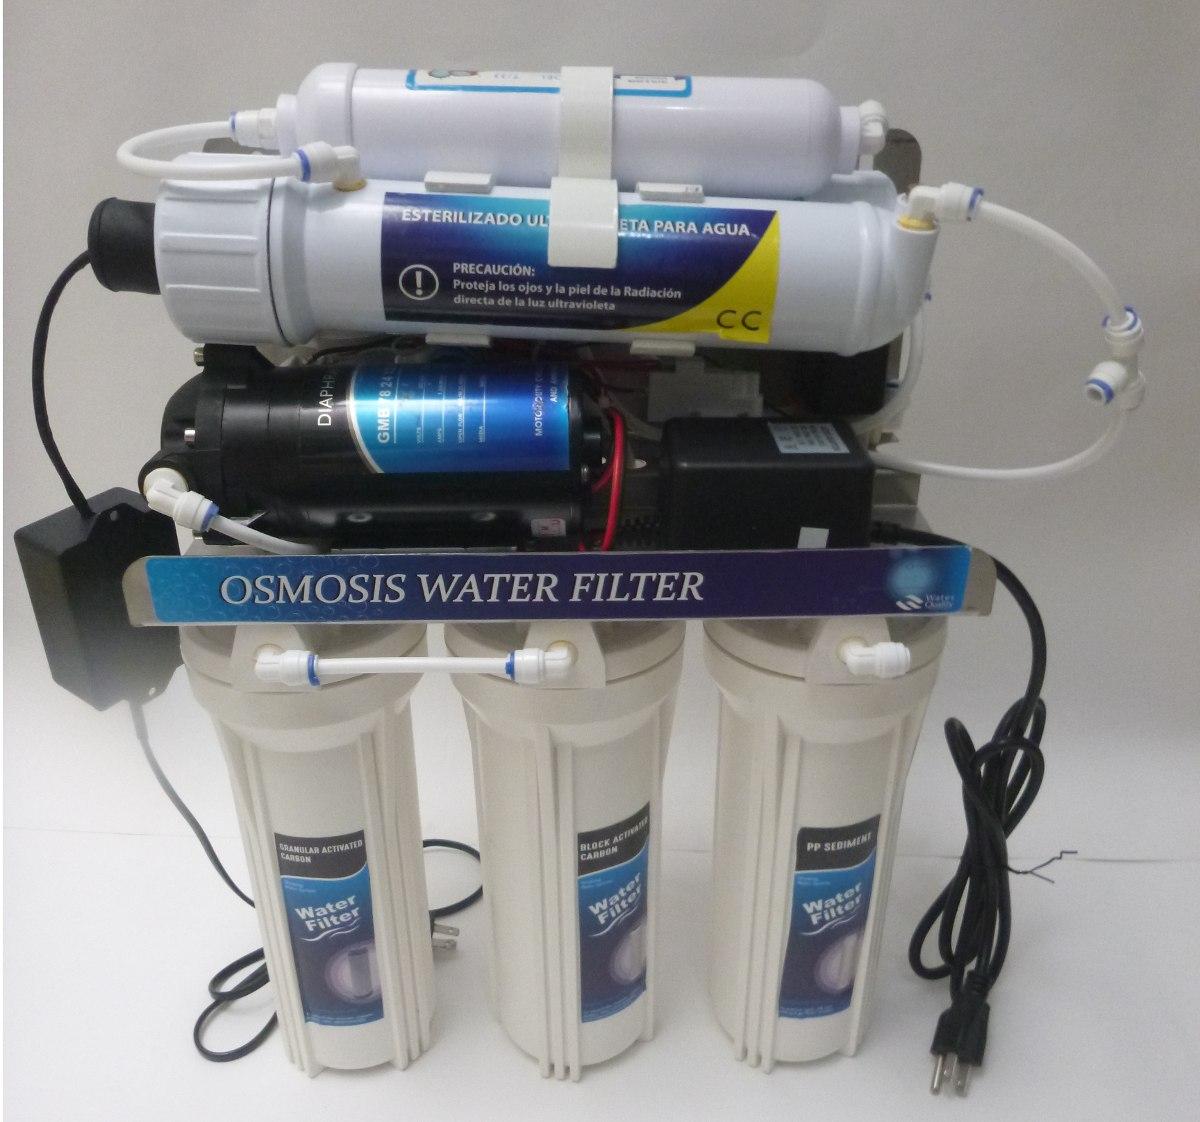 Filtro de agua osmosis inversa ultravioleta 100 gpd 6 - Filtro de osmosis inversa ...